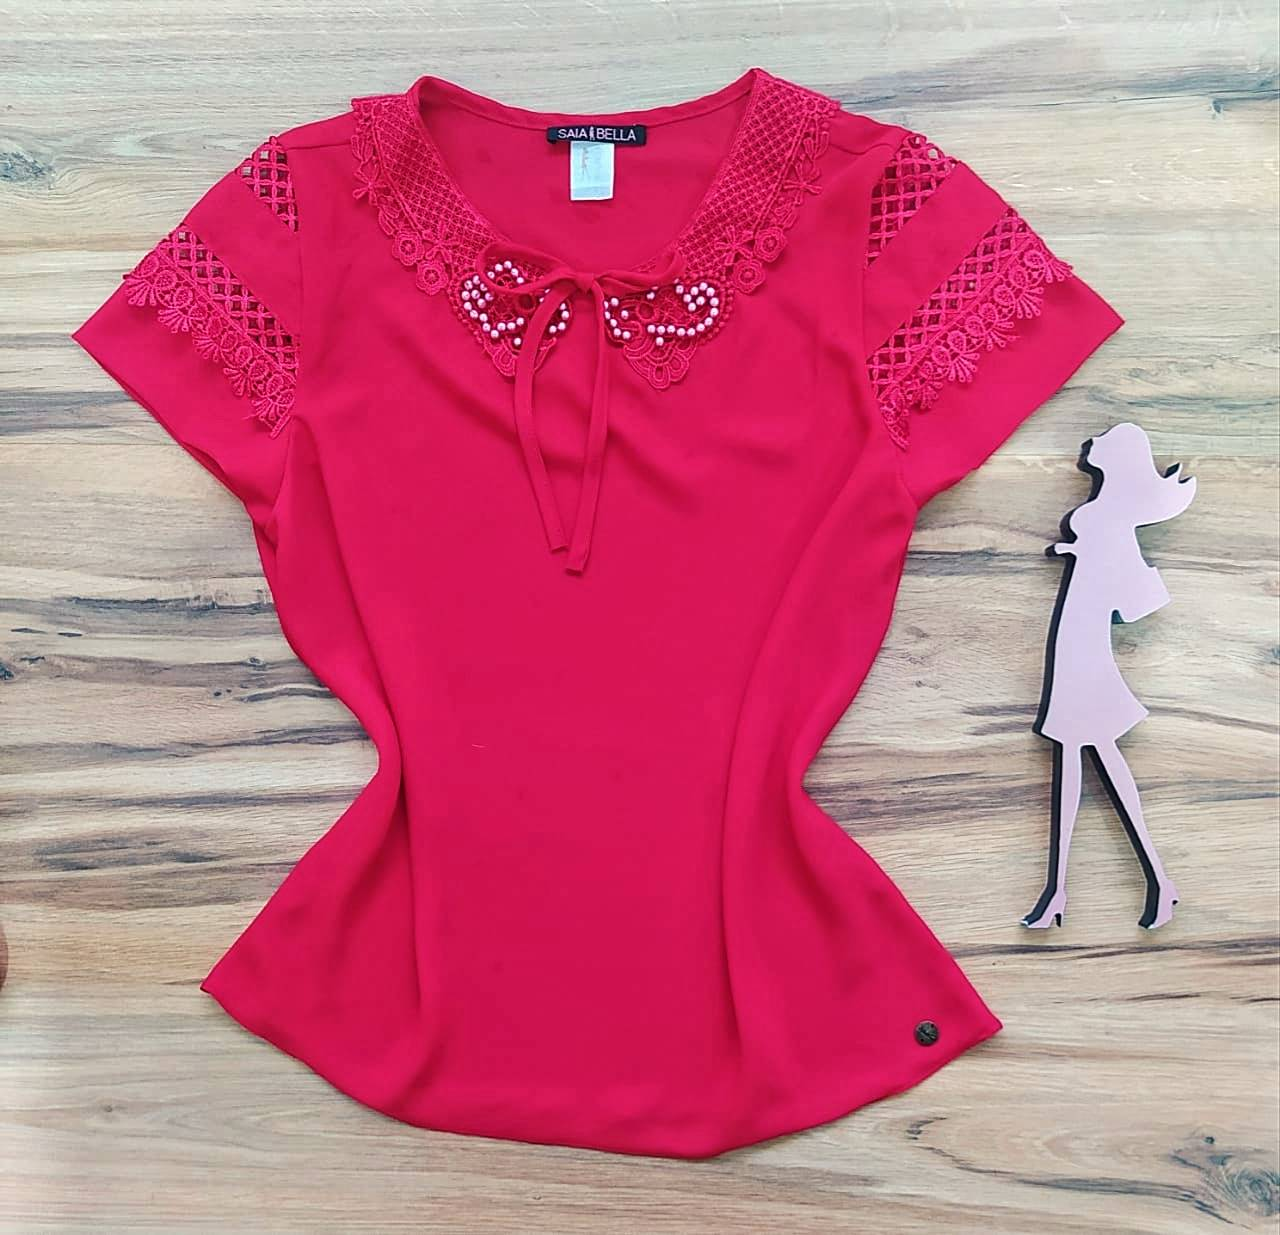 Blusa Louise de Renda Saia Bella - SB741020 Vermelho